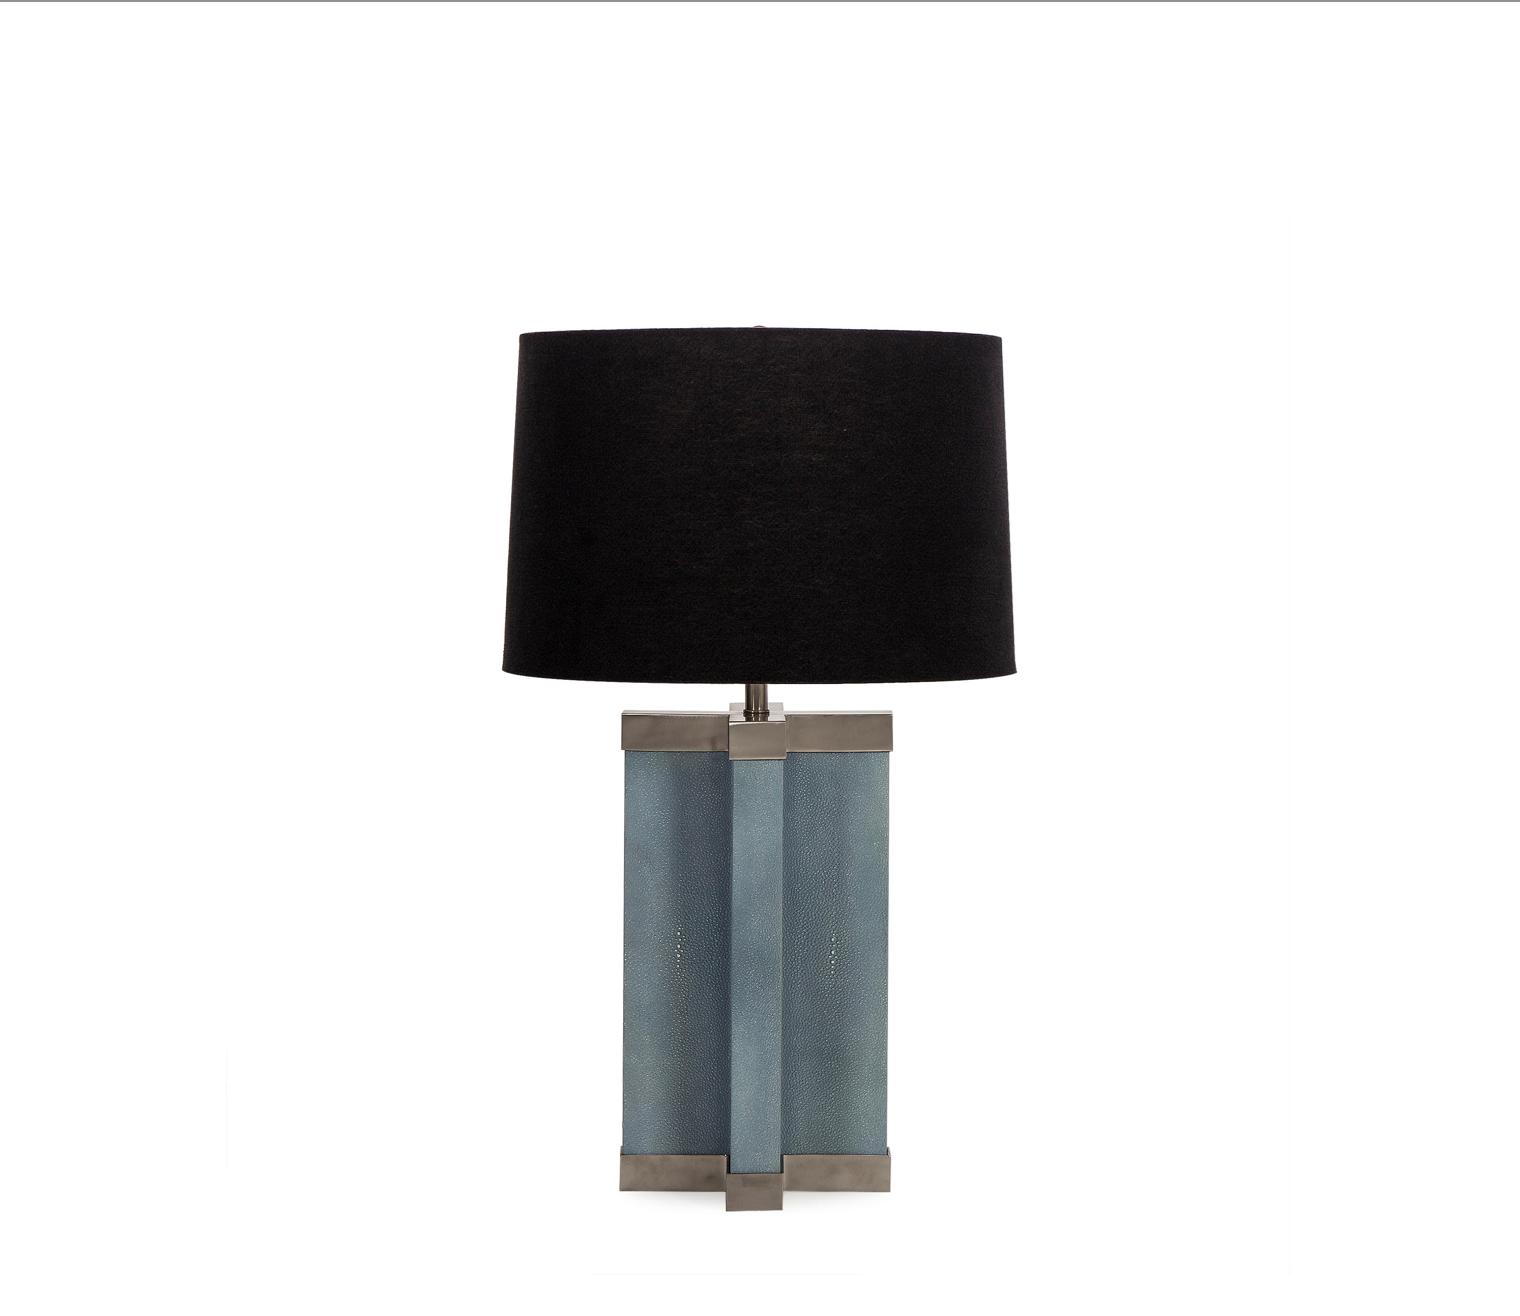 Nellcote_Studio_Lamp2.png